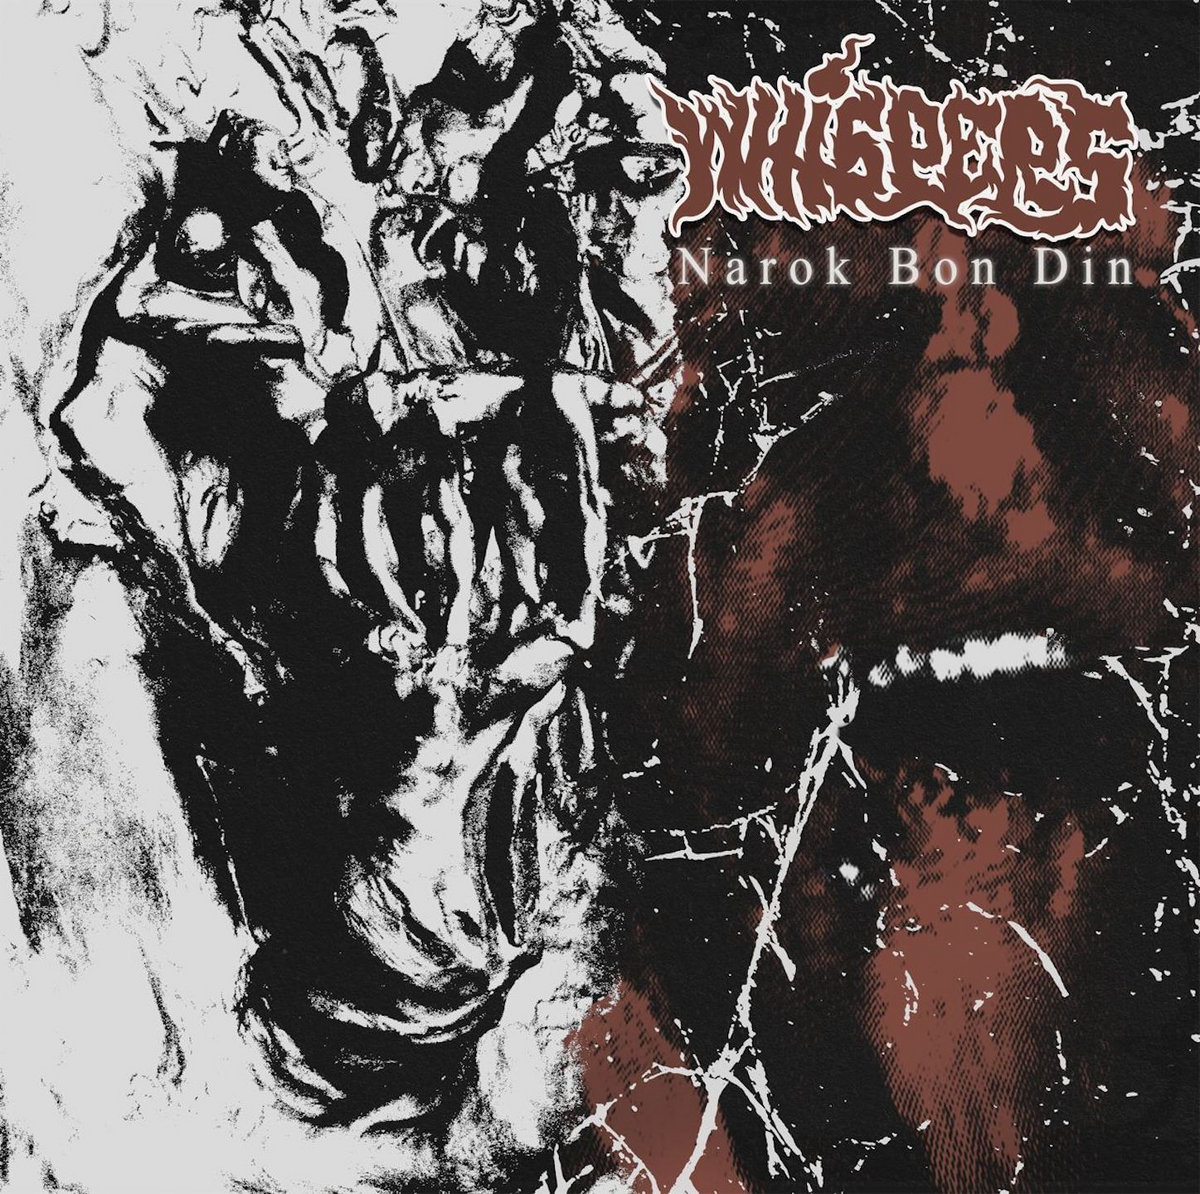 Whispers Thai Bangkok metalcore band EP Narok Bok Din